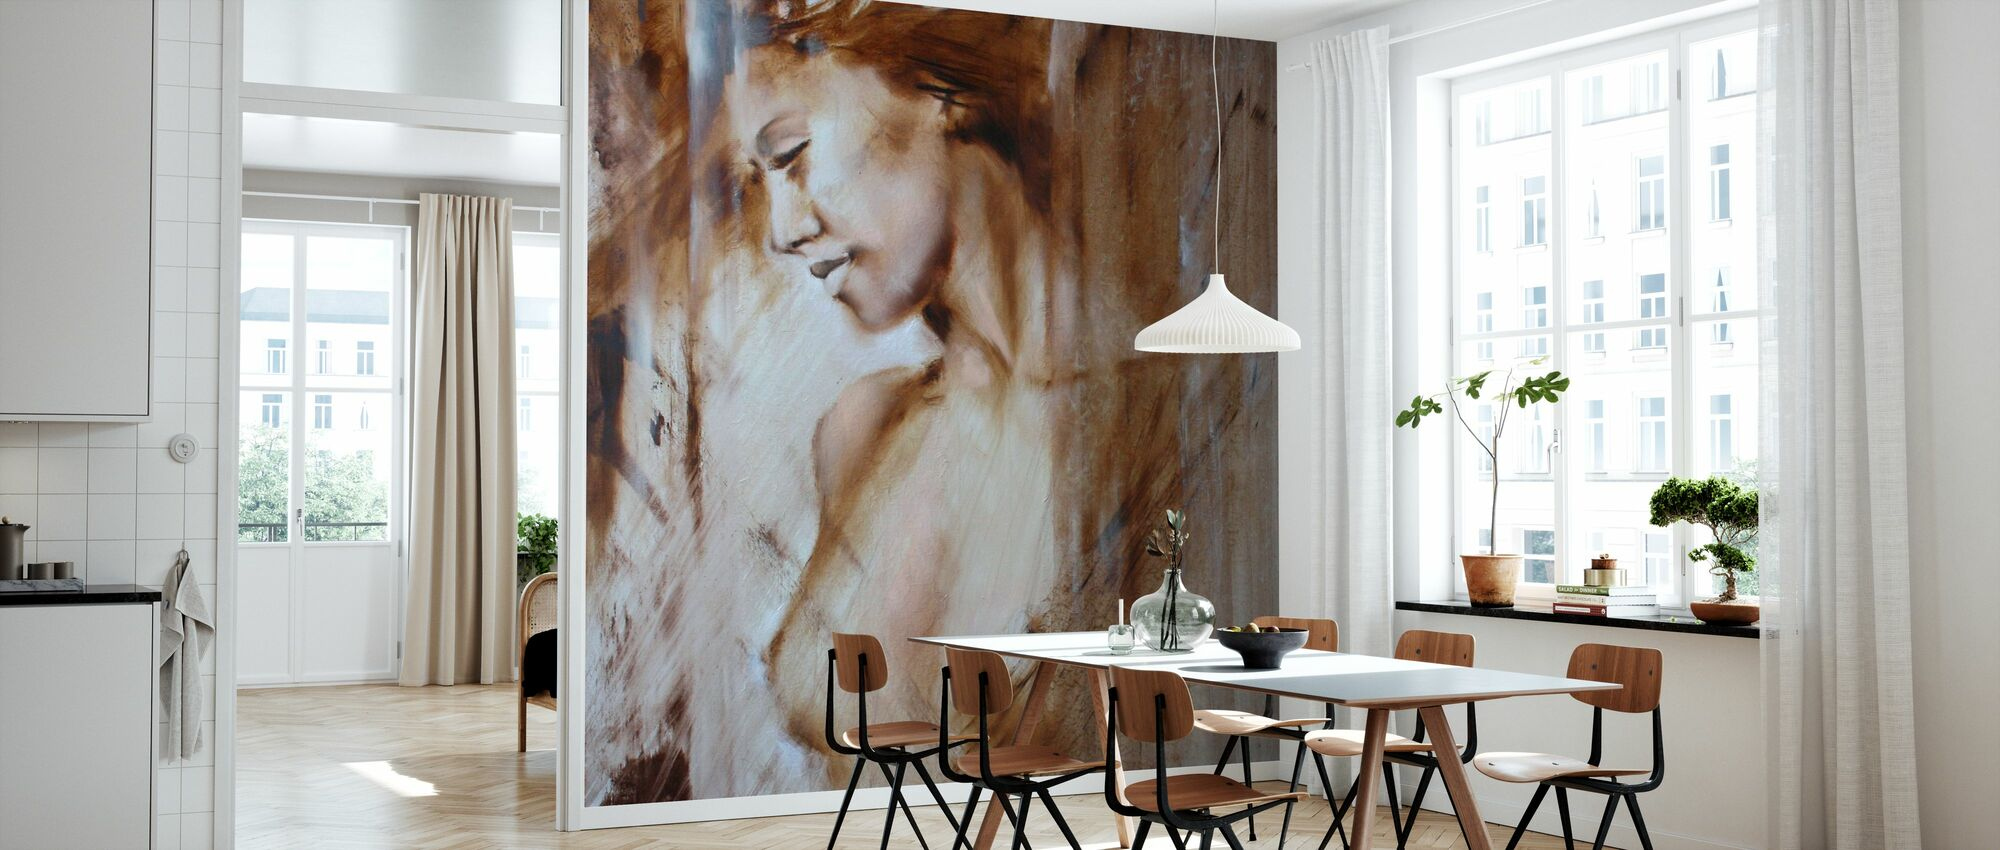 Vera II - Wallpaper - Kitchen